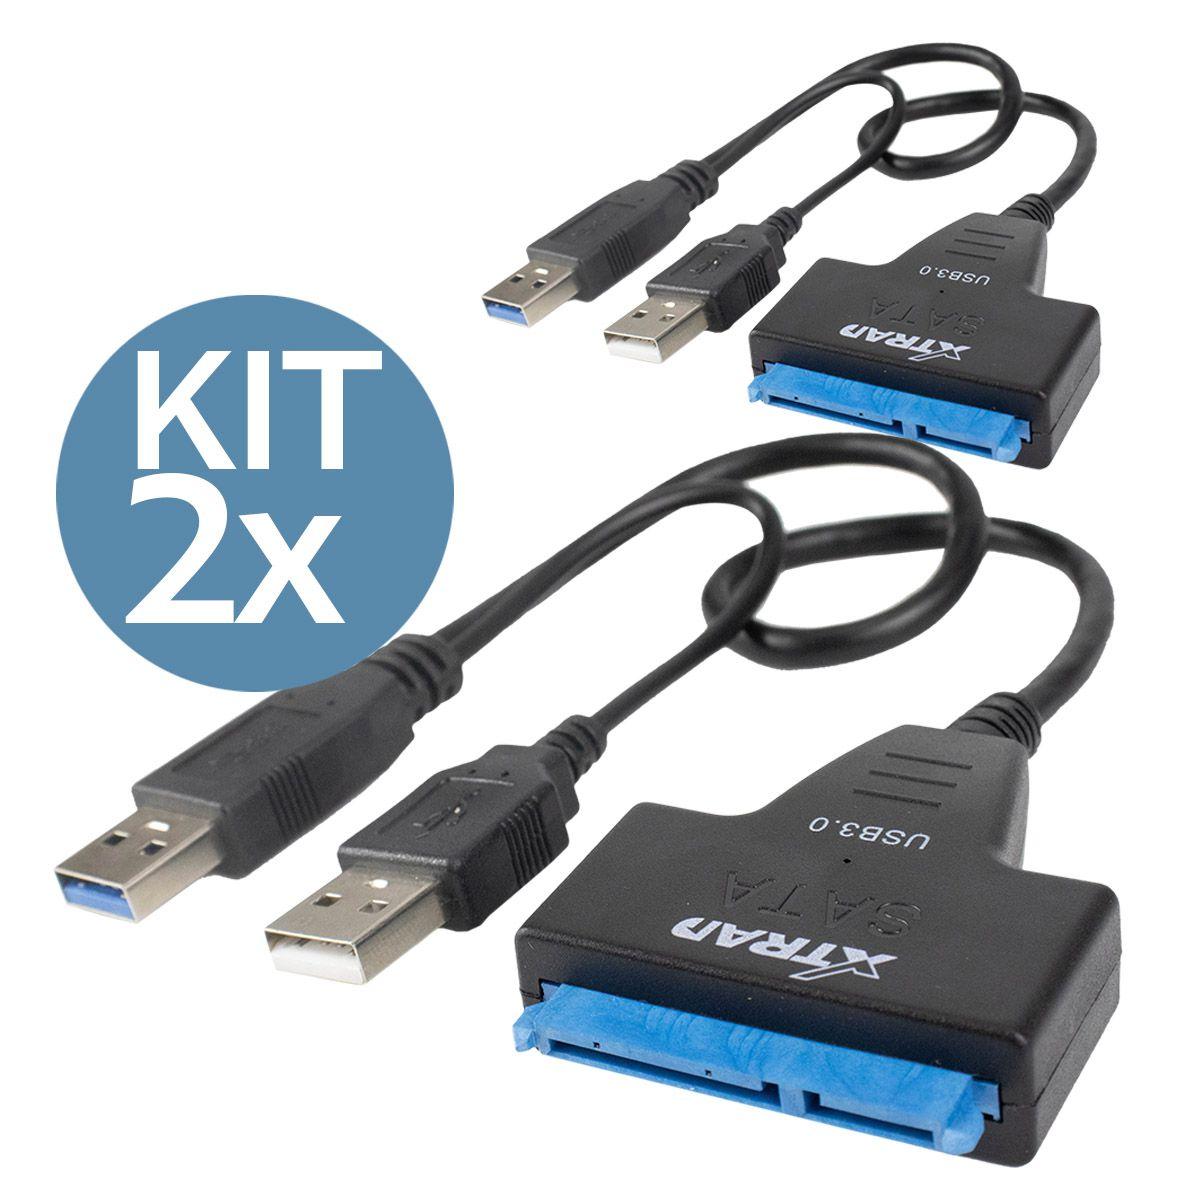 KIT 2x Cabo Adaptador Usb 3.0 para Sata com Entrada para Fonte 12v Xtrad XT2151